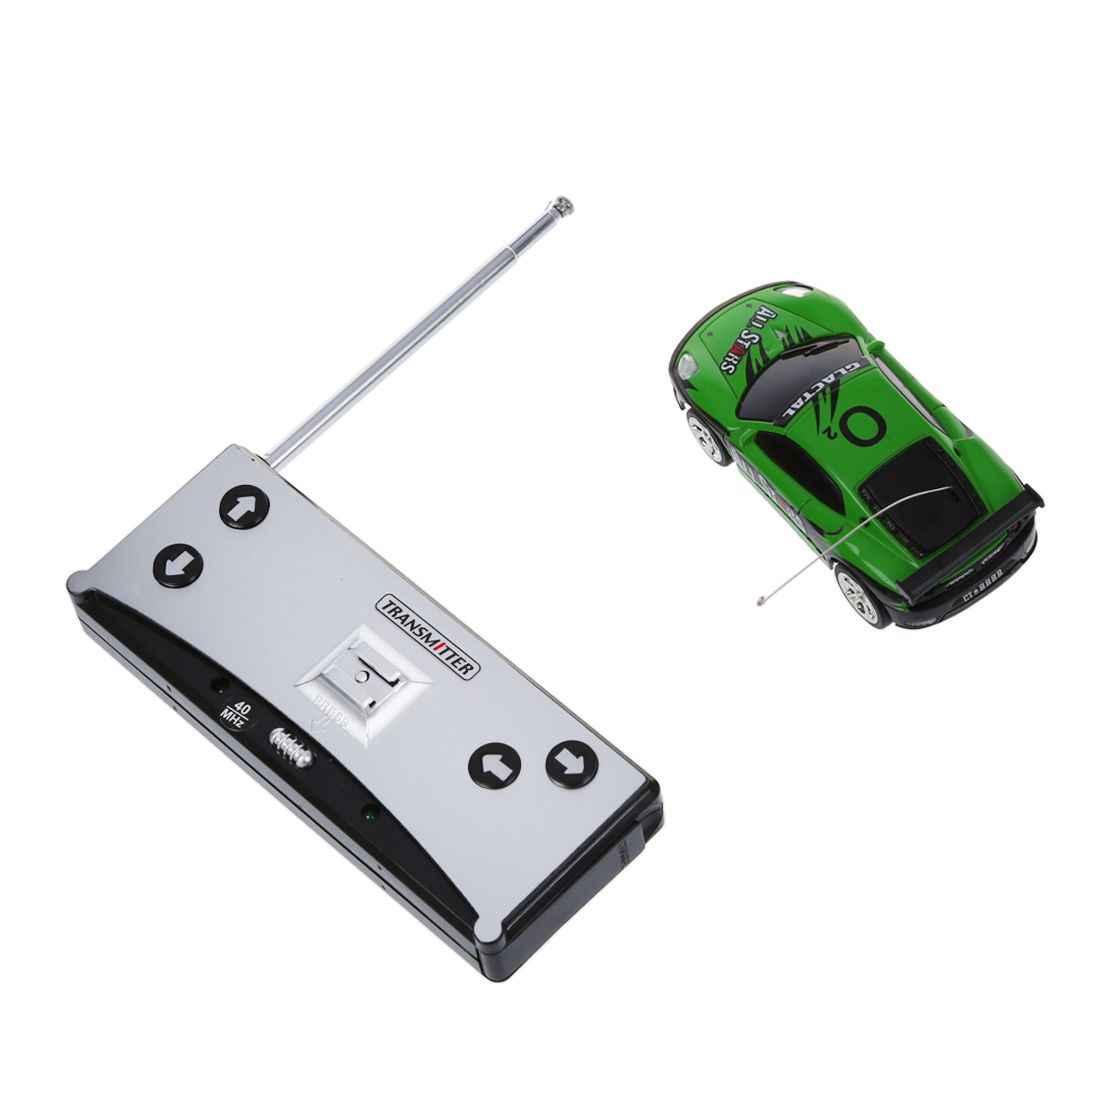 Hot AMS-Mini RC Remote Control Mobil Balap Mobil Mainan Dalam Minuman Dapat 1:58 (Hijau) Baru